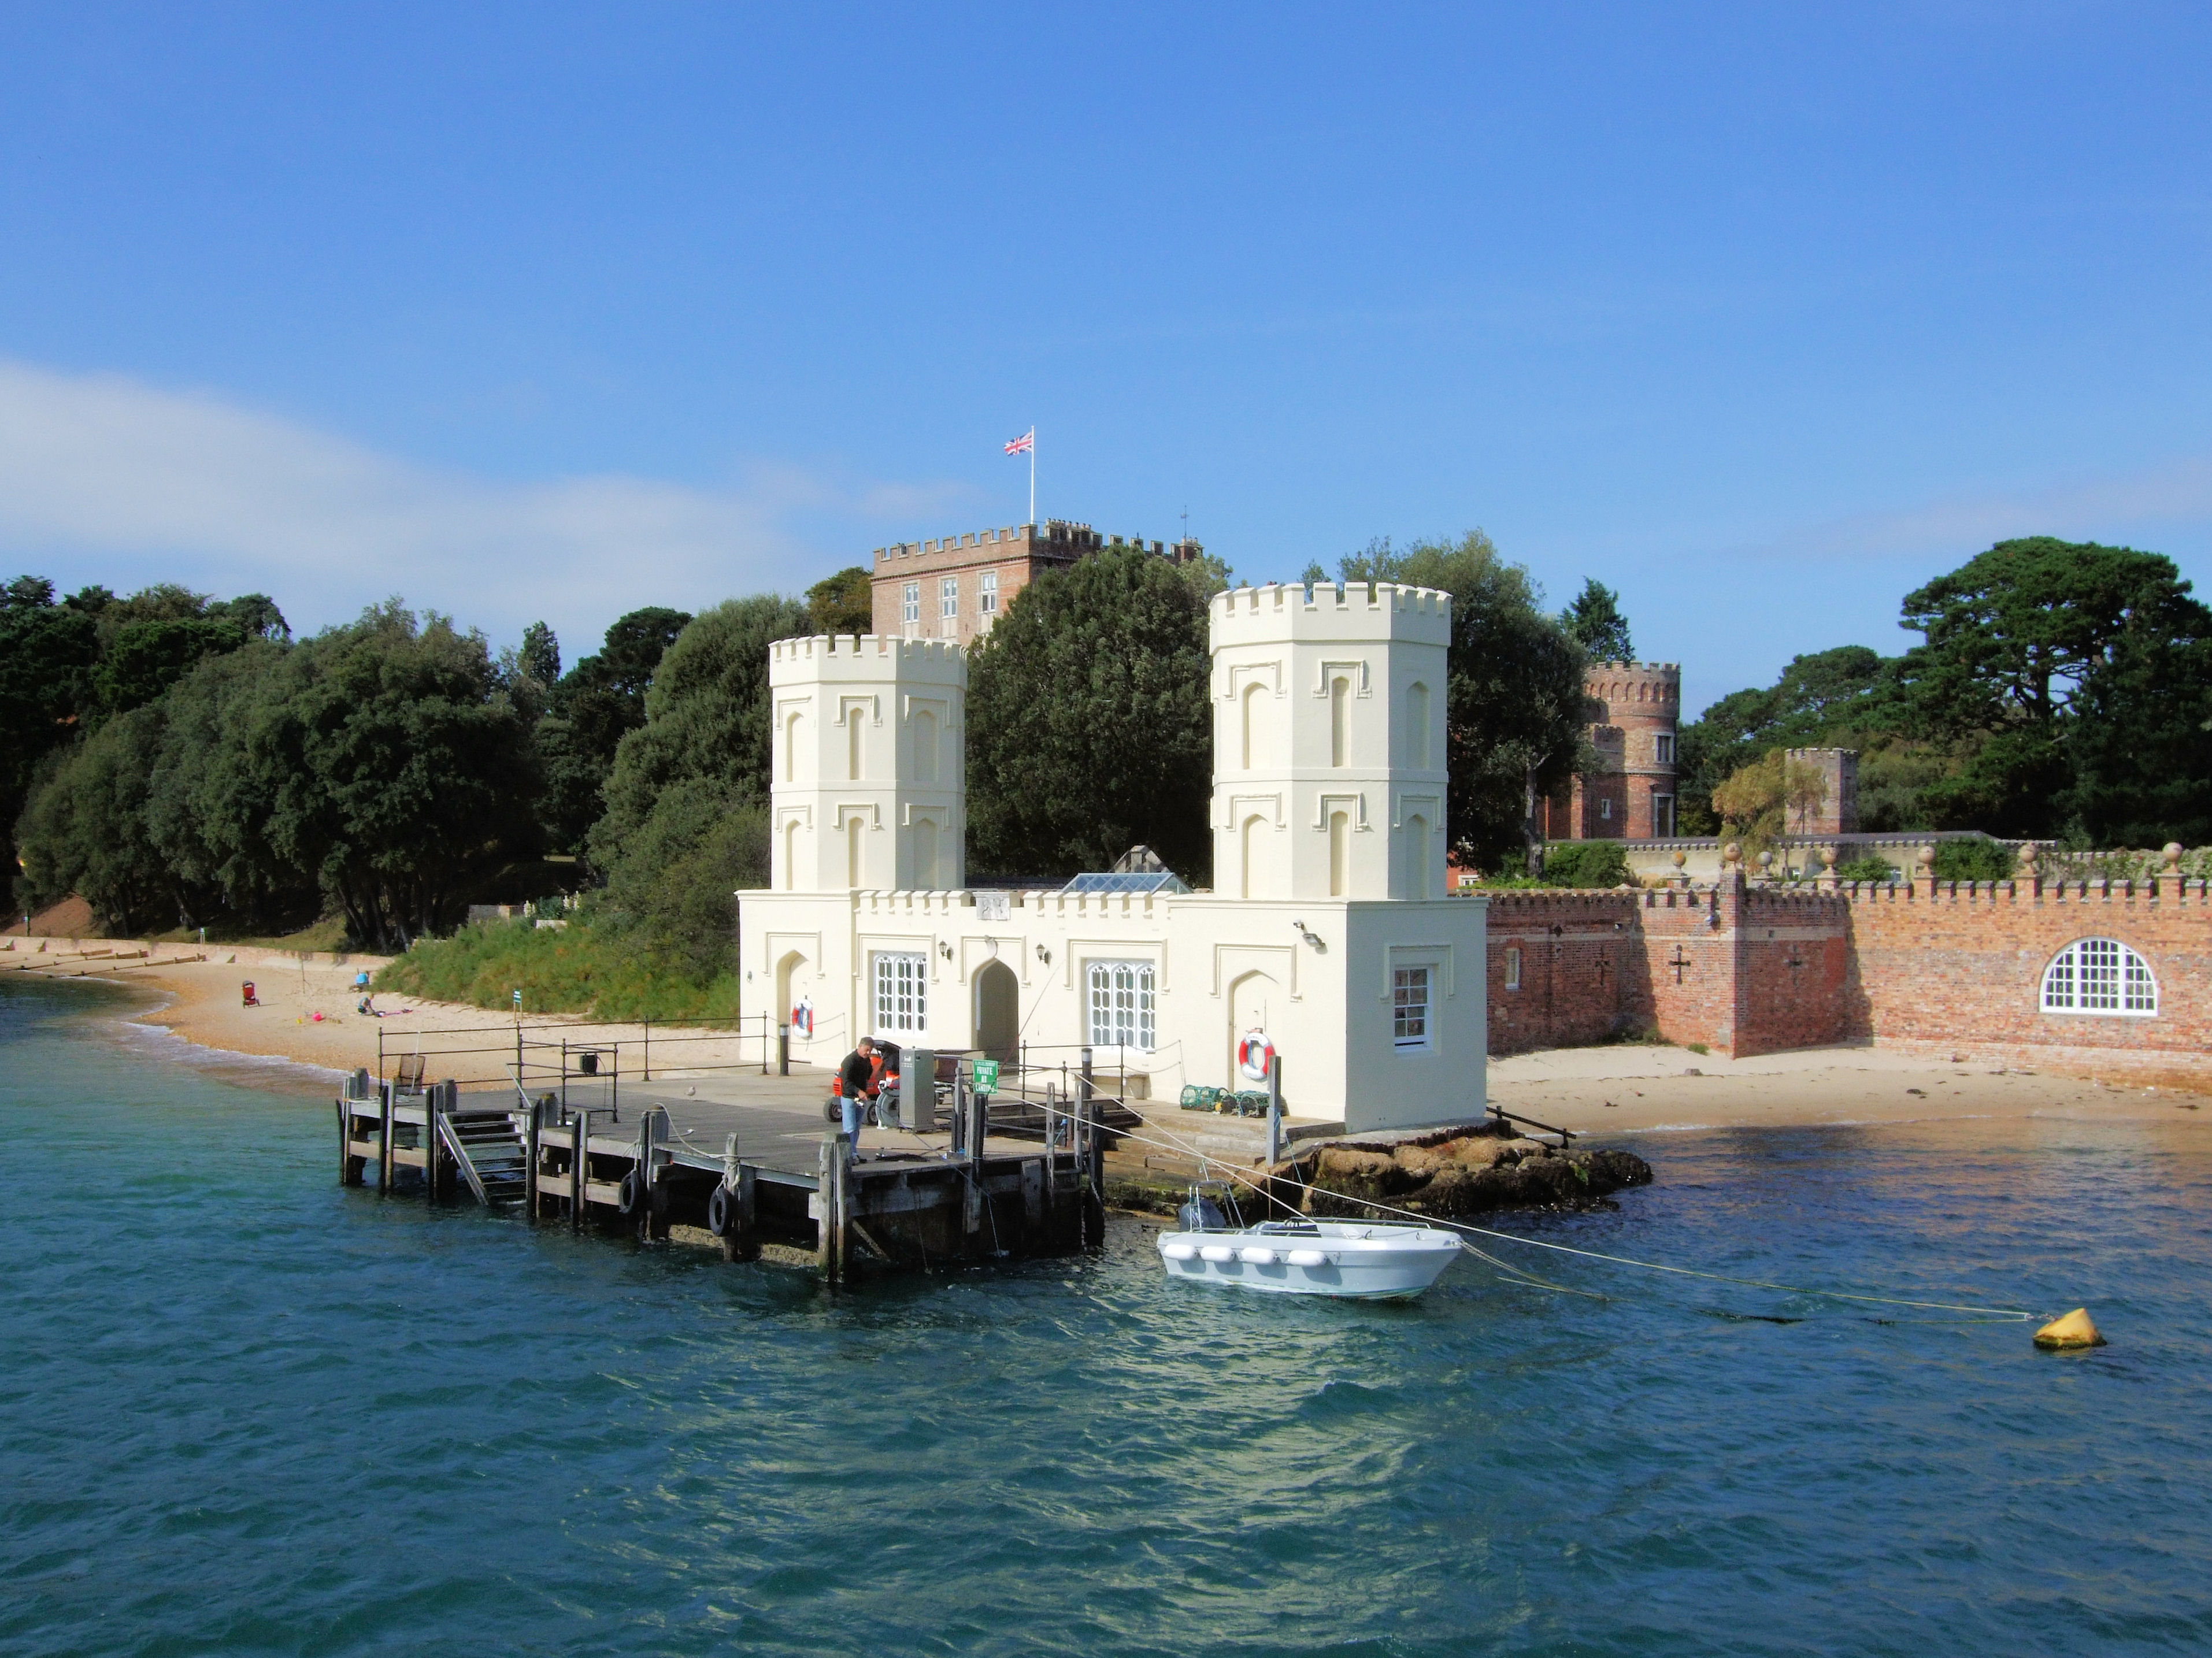 File:The Pier, Brownsea Island, Poole, Dorset.jpg ...